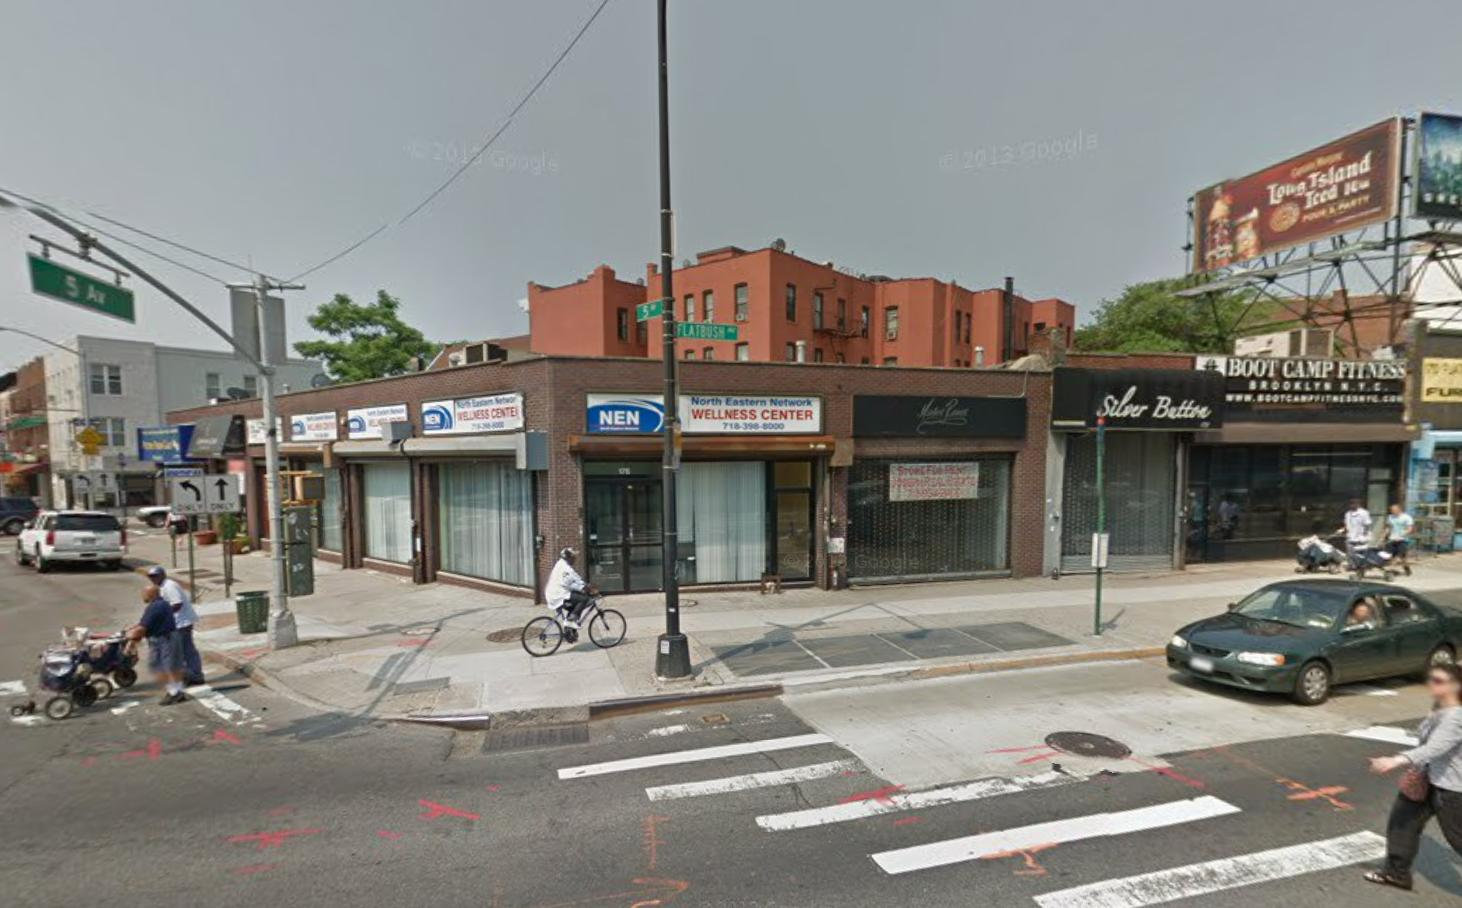 178 Flatbush Avenue